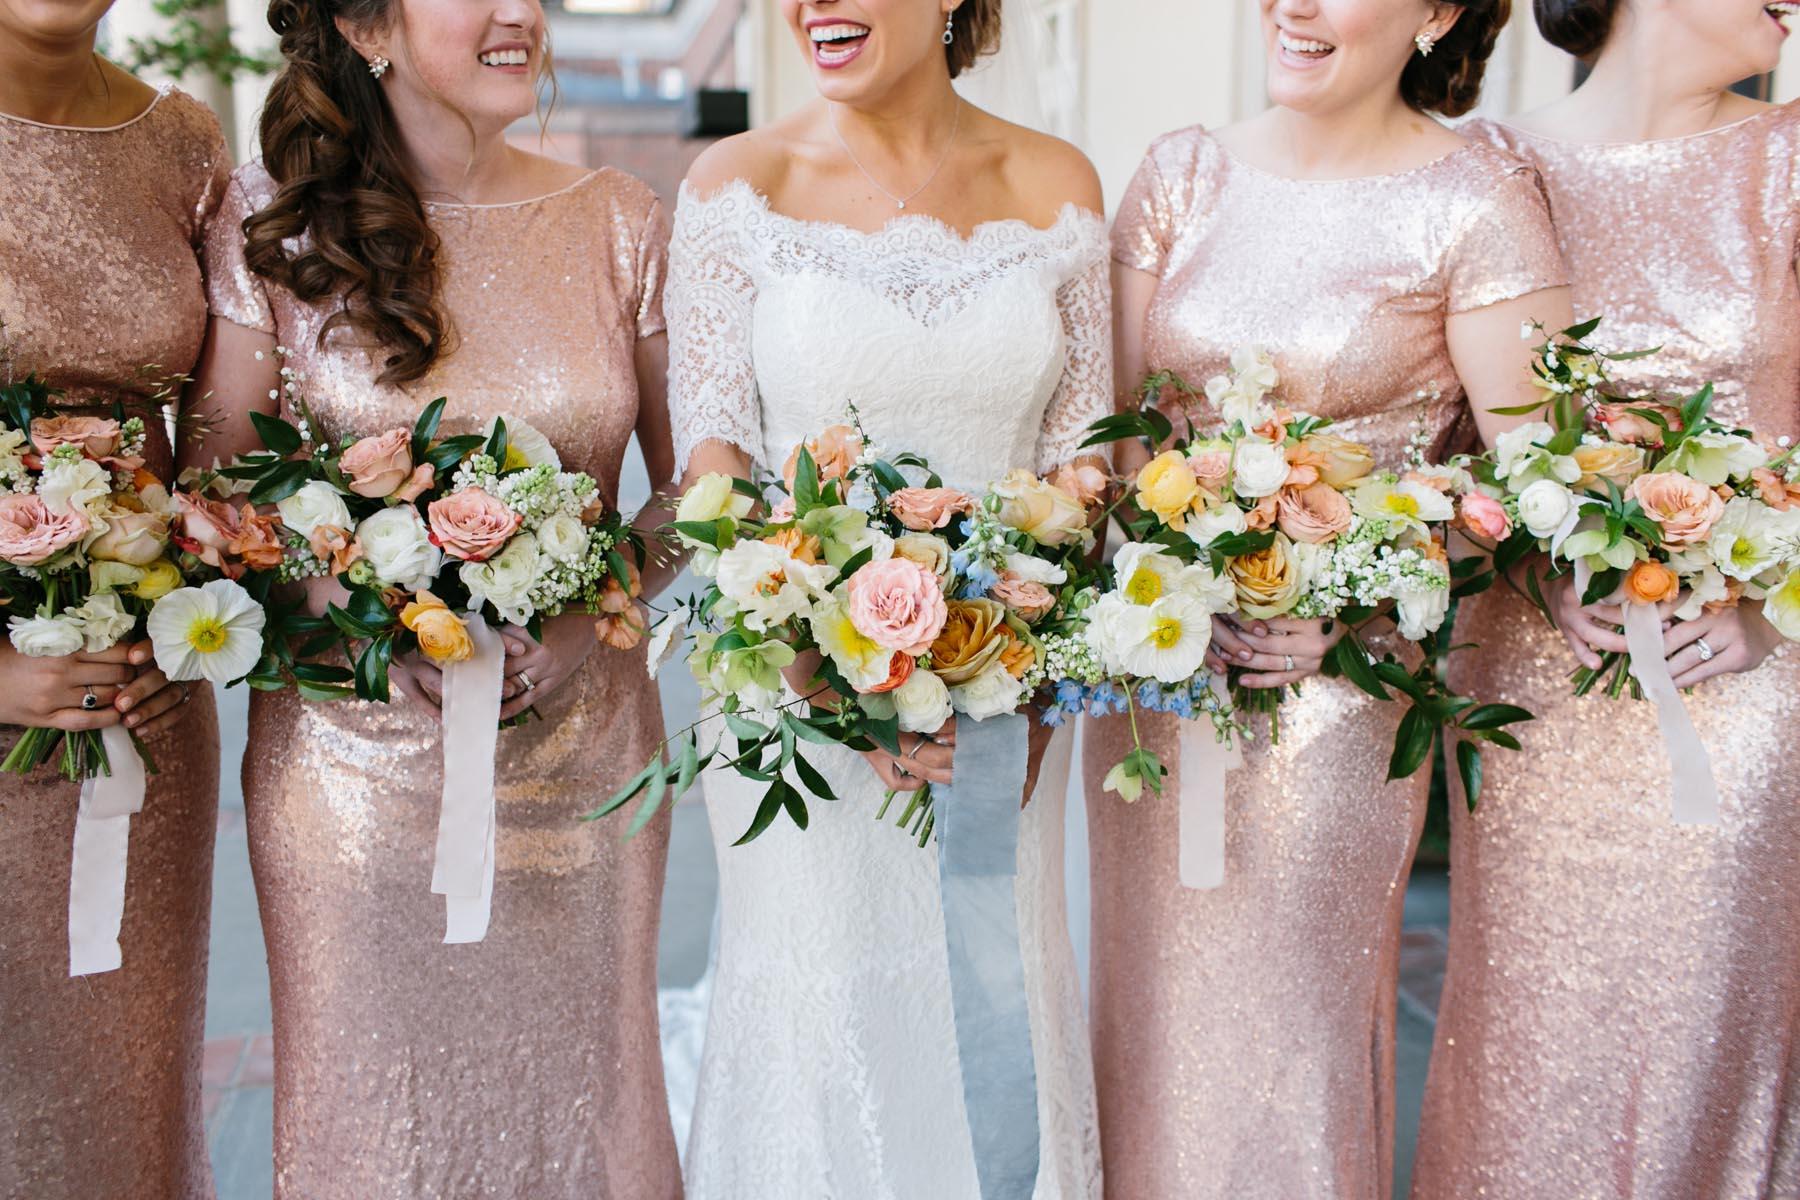 kjellman wedding blog biltmore wedding -51